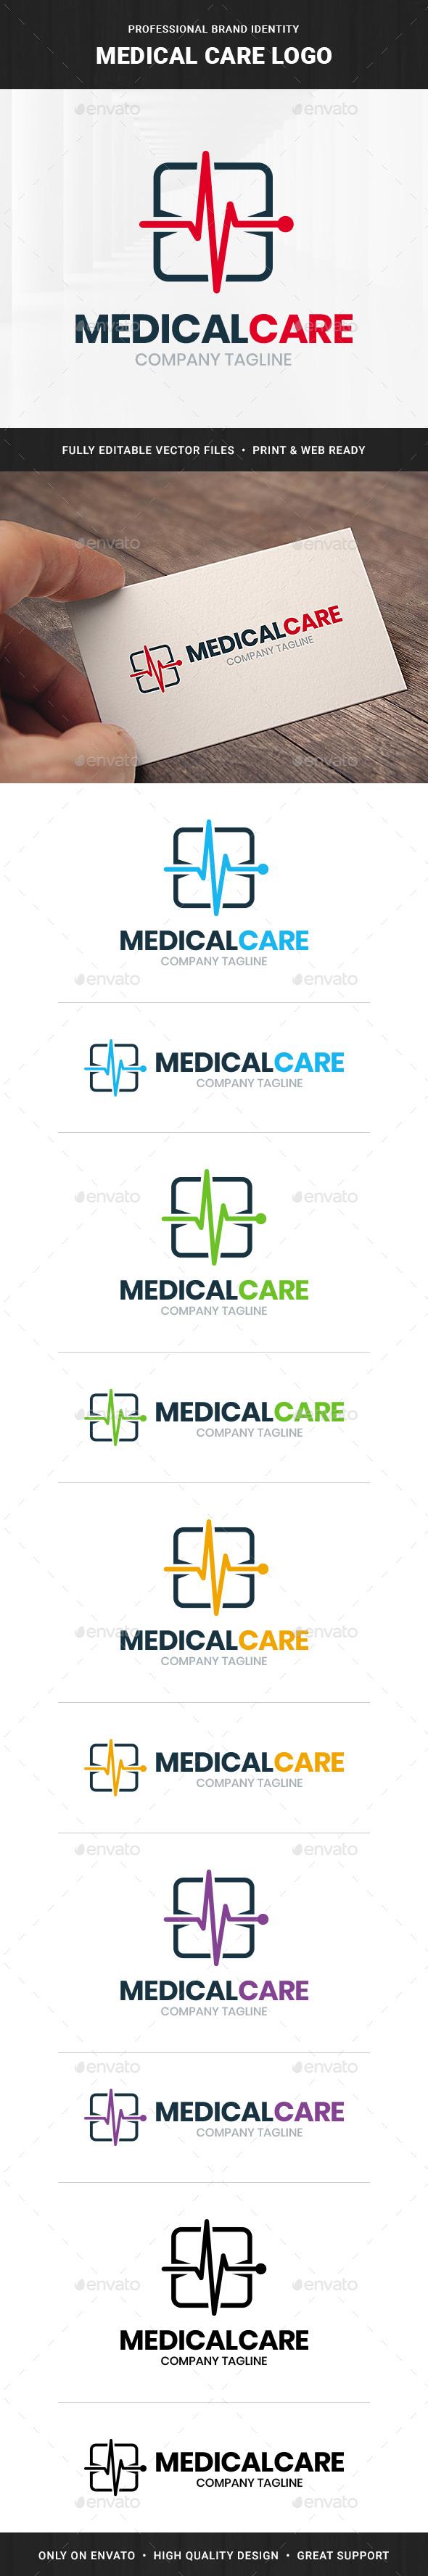 Medical Care Logo Template